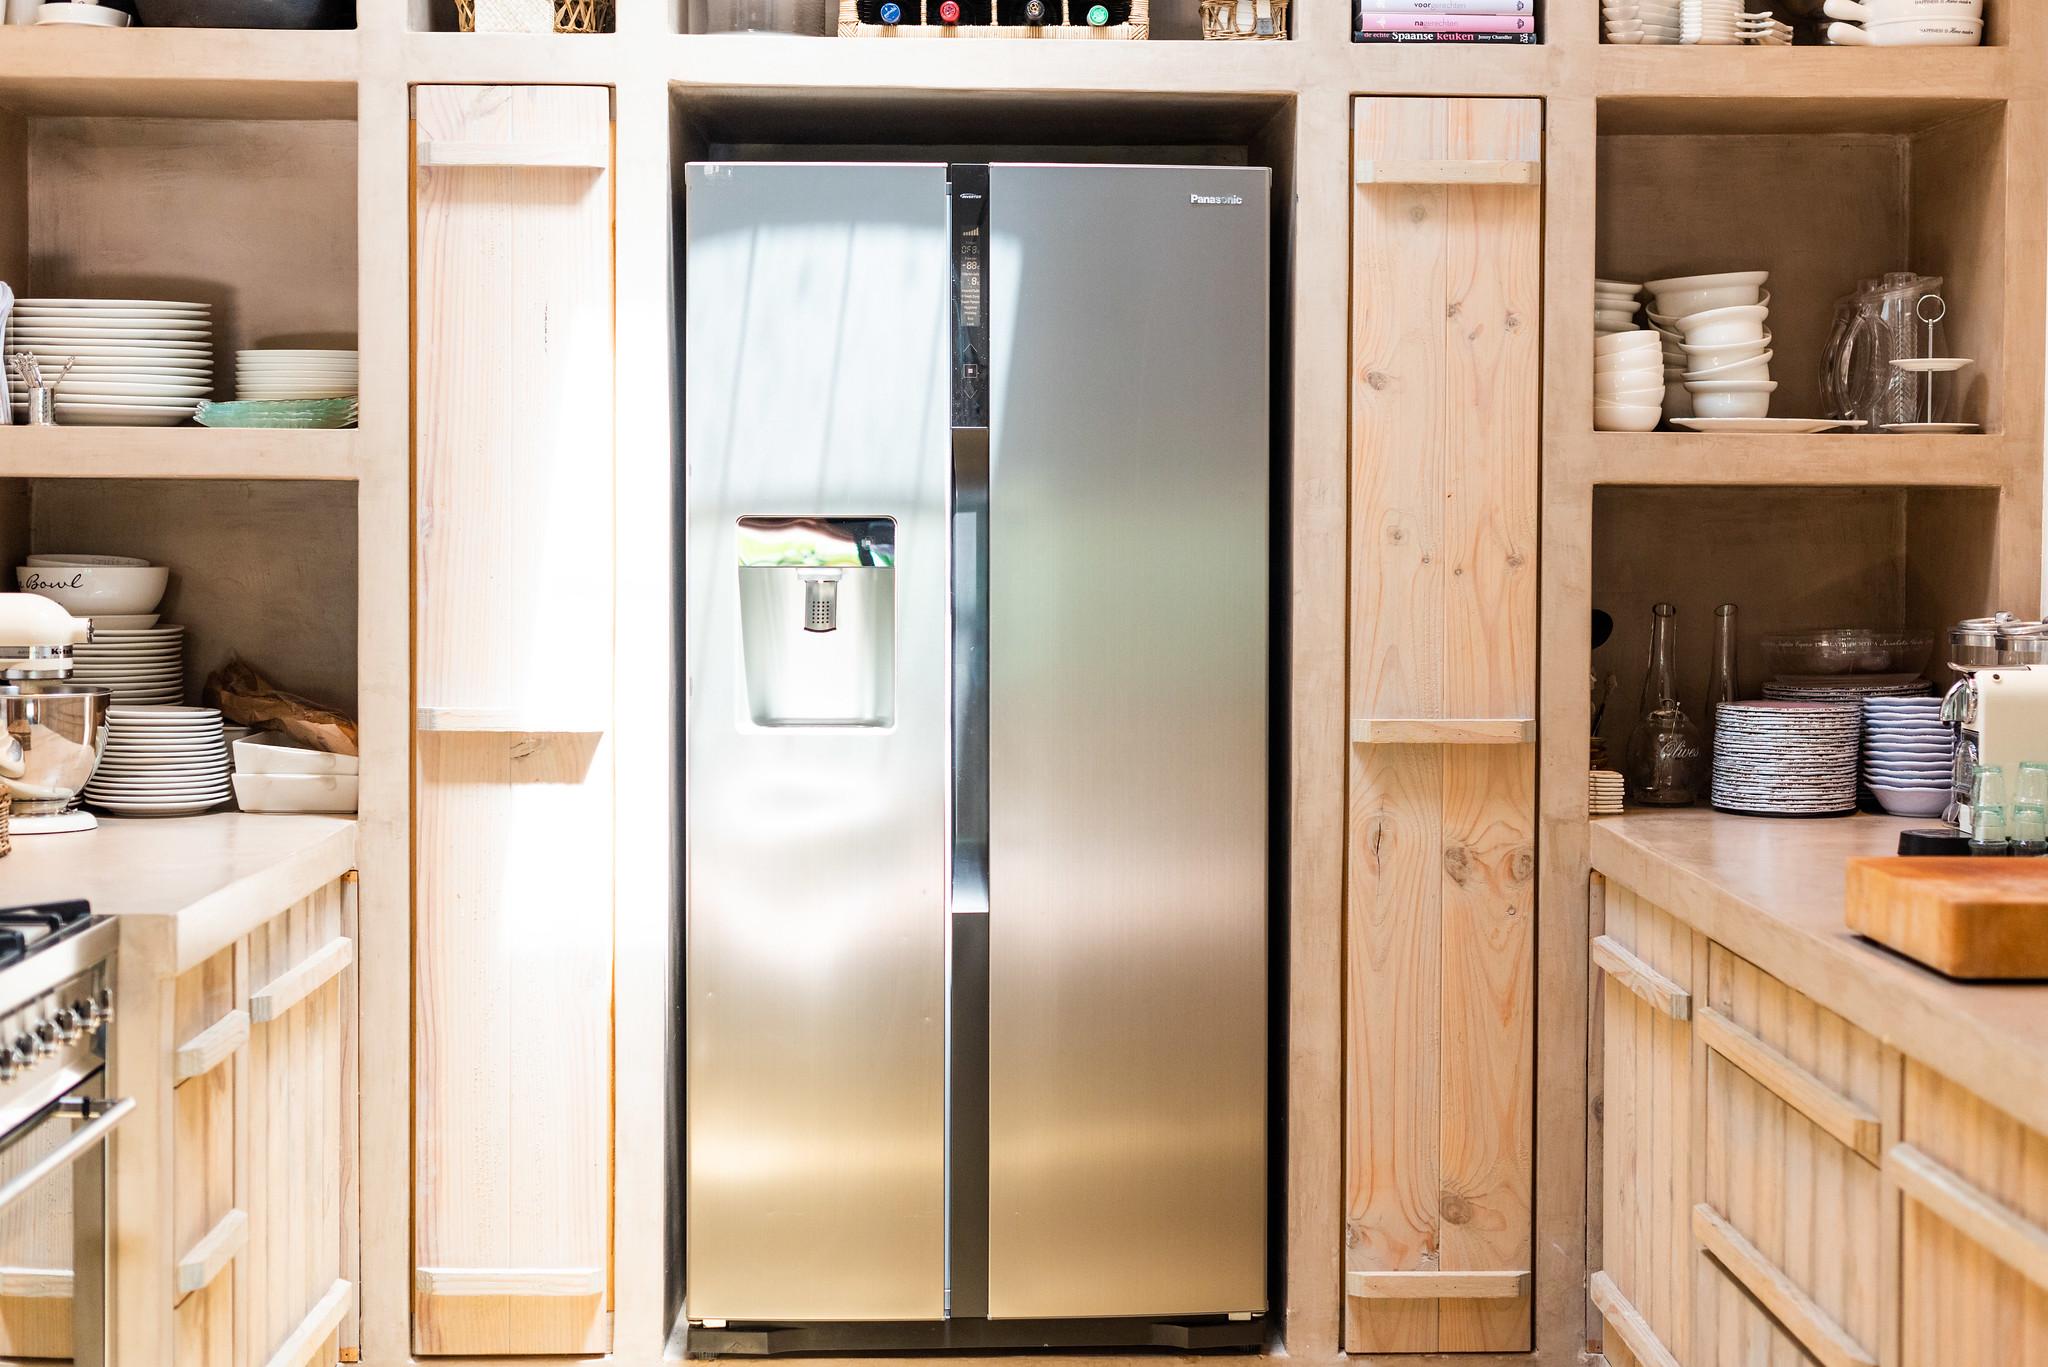 https://www.white-ibiza.com/wp-content/uploads/2020/05/white-ibiza-villas-can-riviere-interior-kitchen.jpg